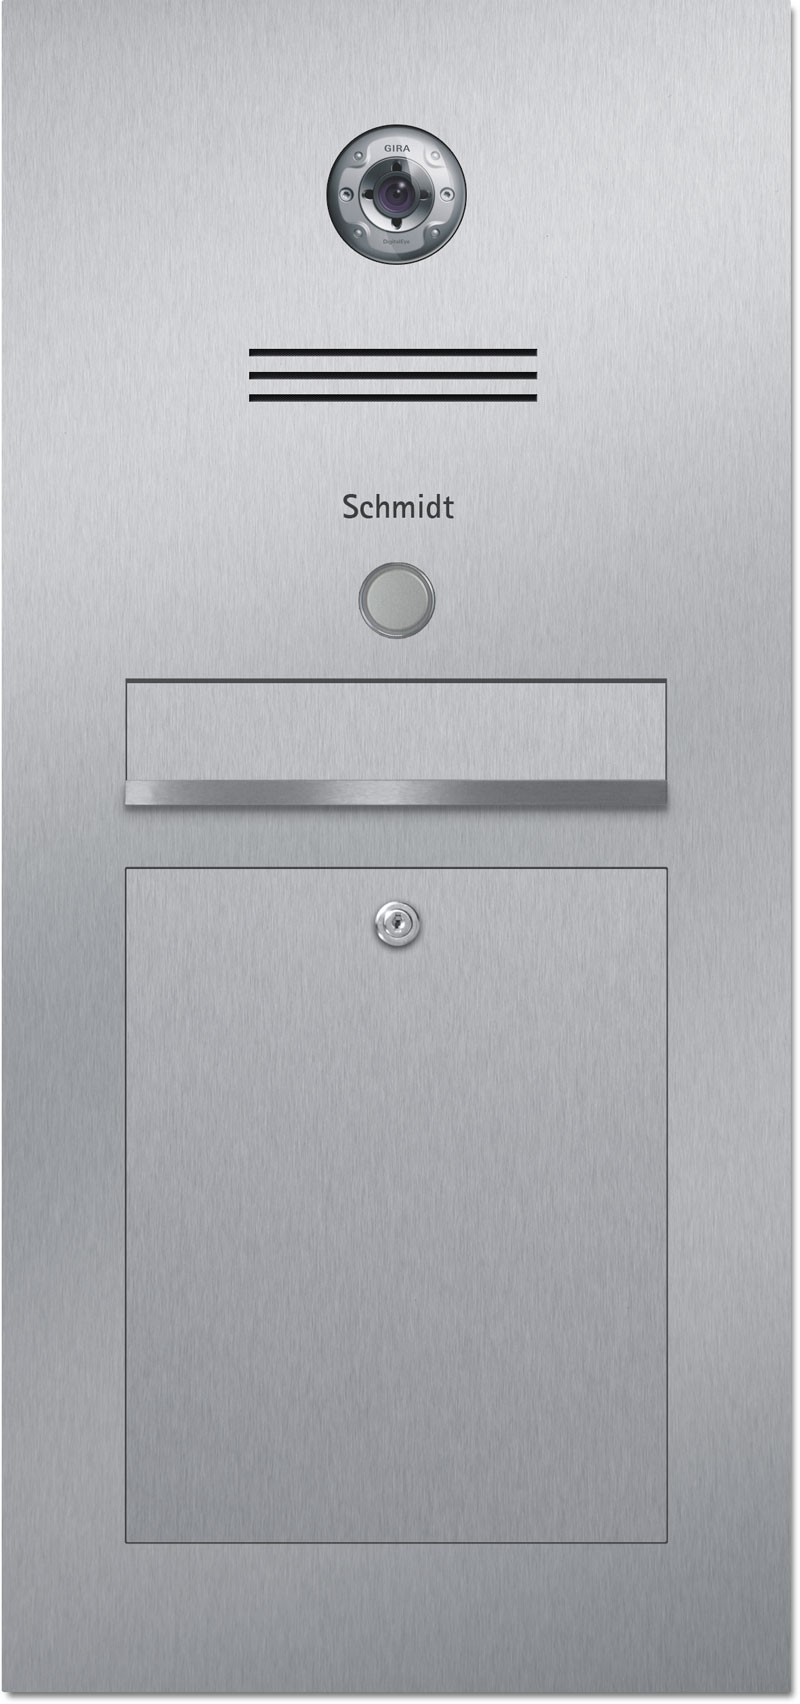 Türsprechanlage Edelstahl Konfigurator Gira Beschriftung Klingel